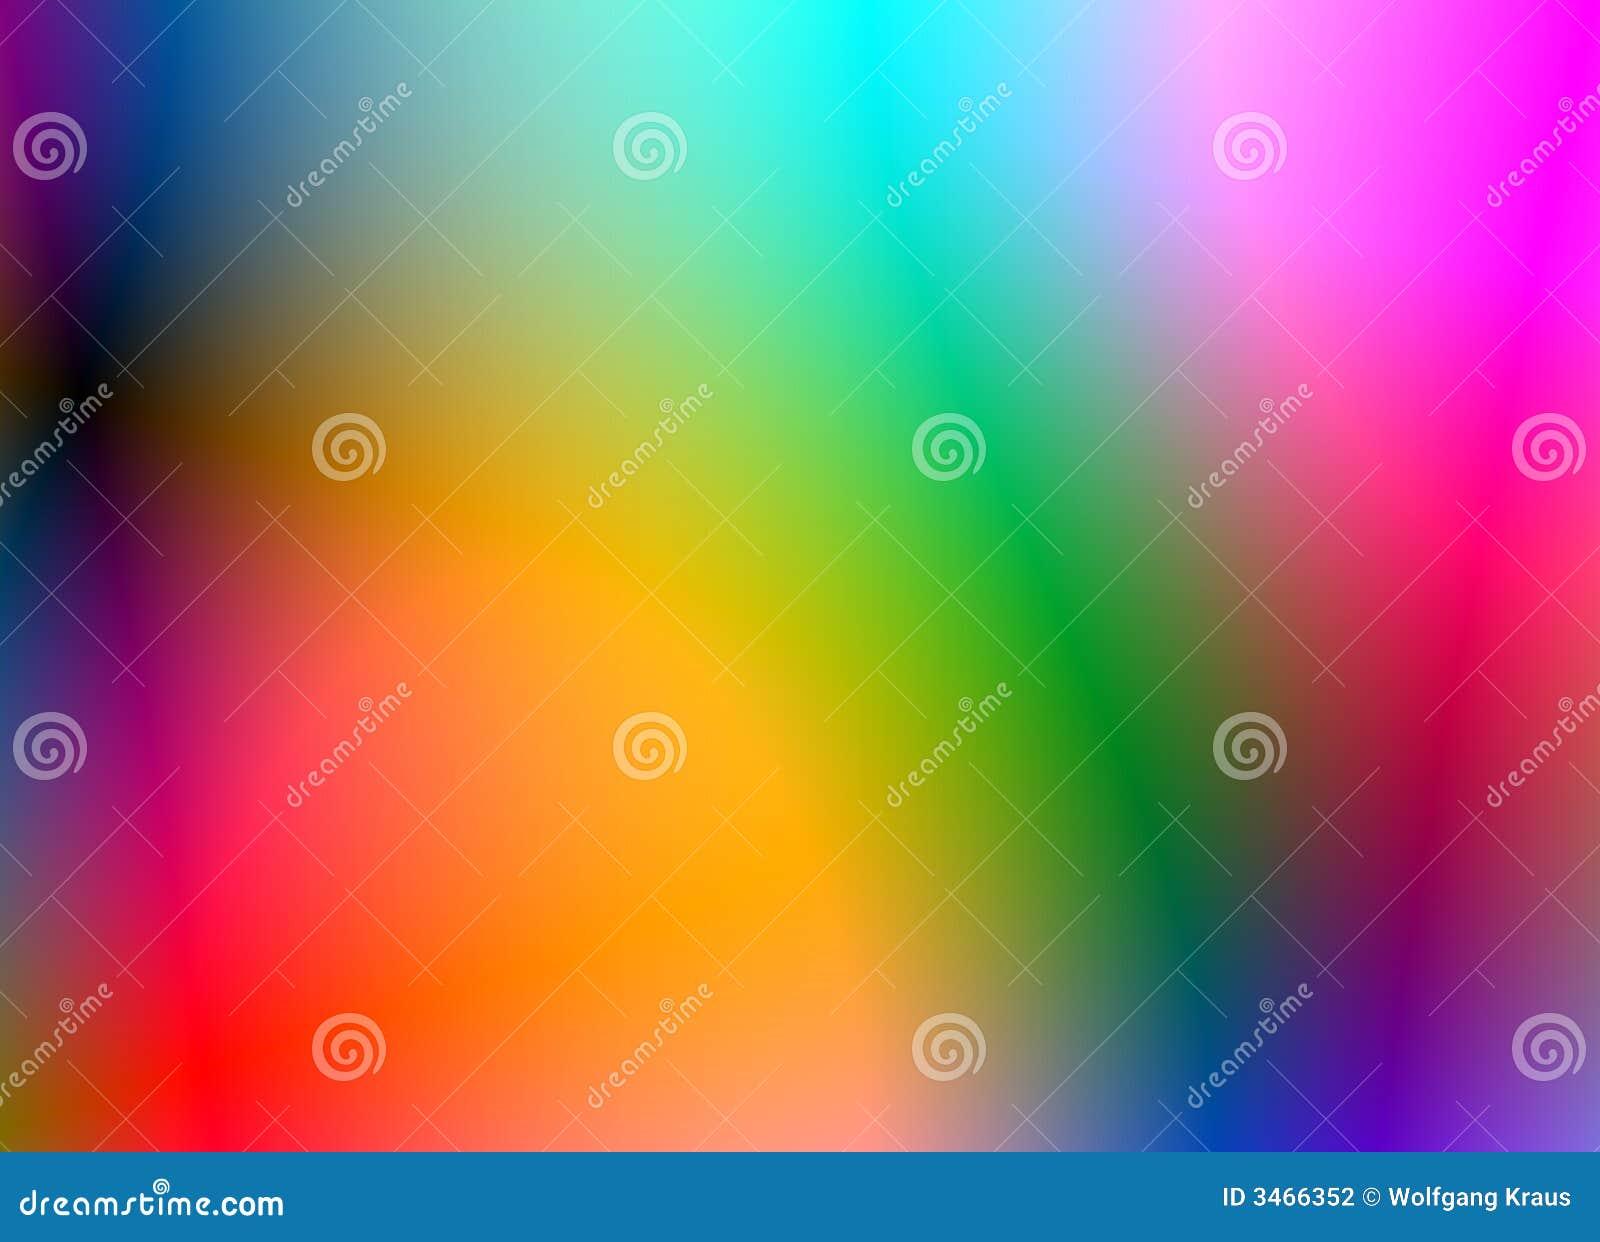 Bright vibrant colors stock photo image of card artwork for Bright vibrant colors